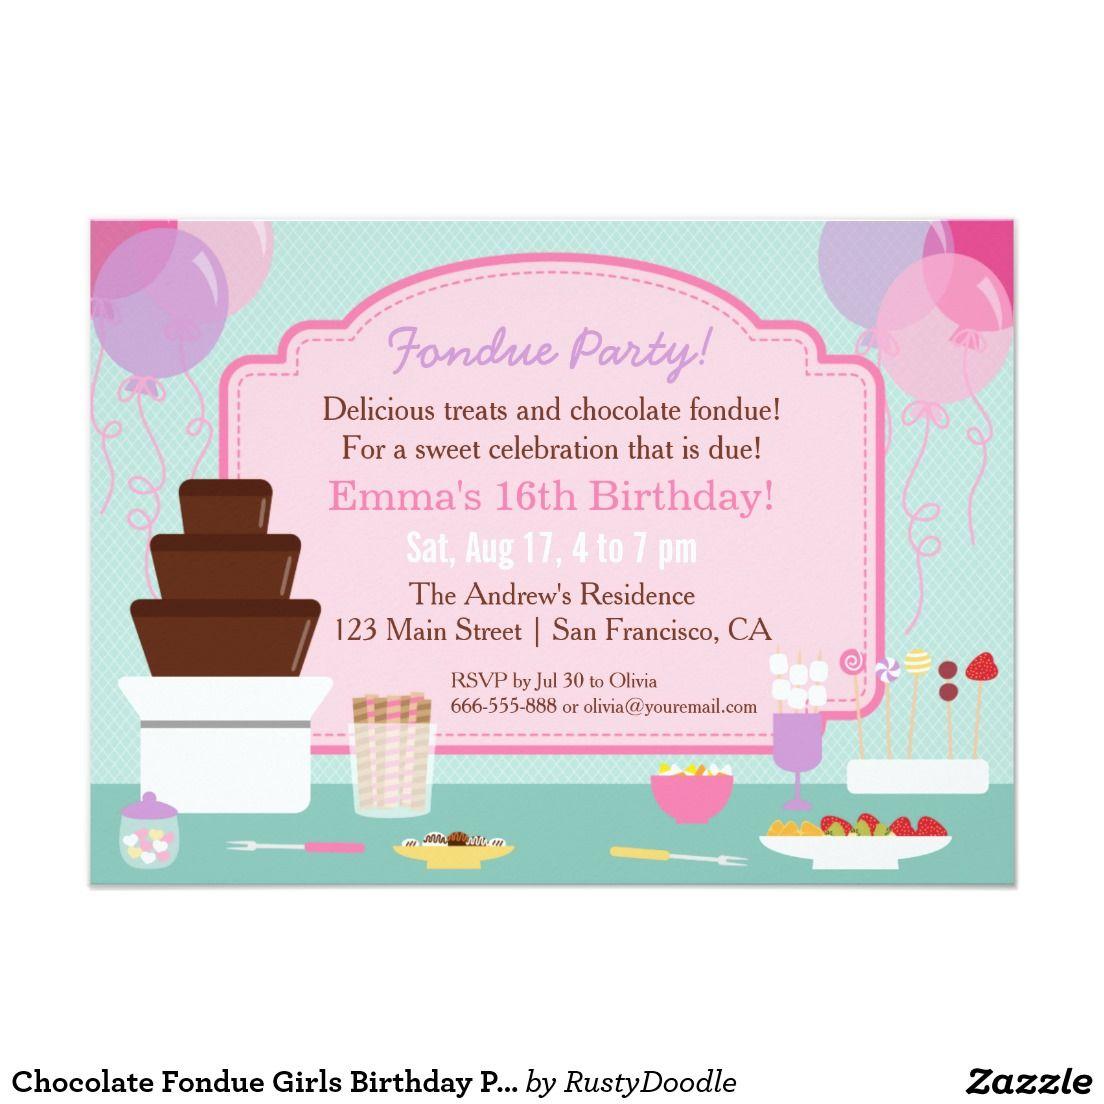 Chocolate Fondue Girls Birthday Party Invitations | Teens 13-17 ...